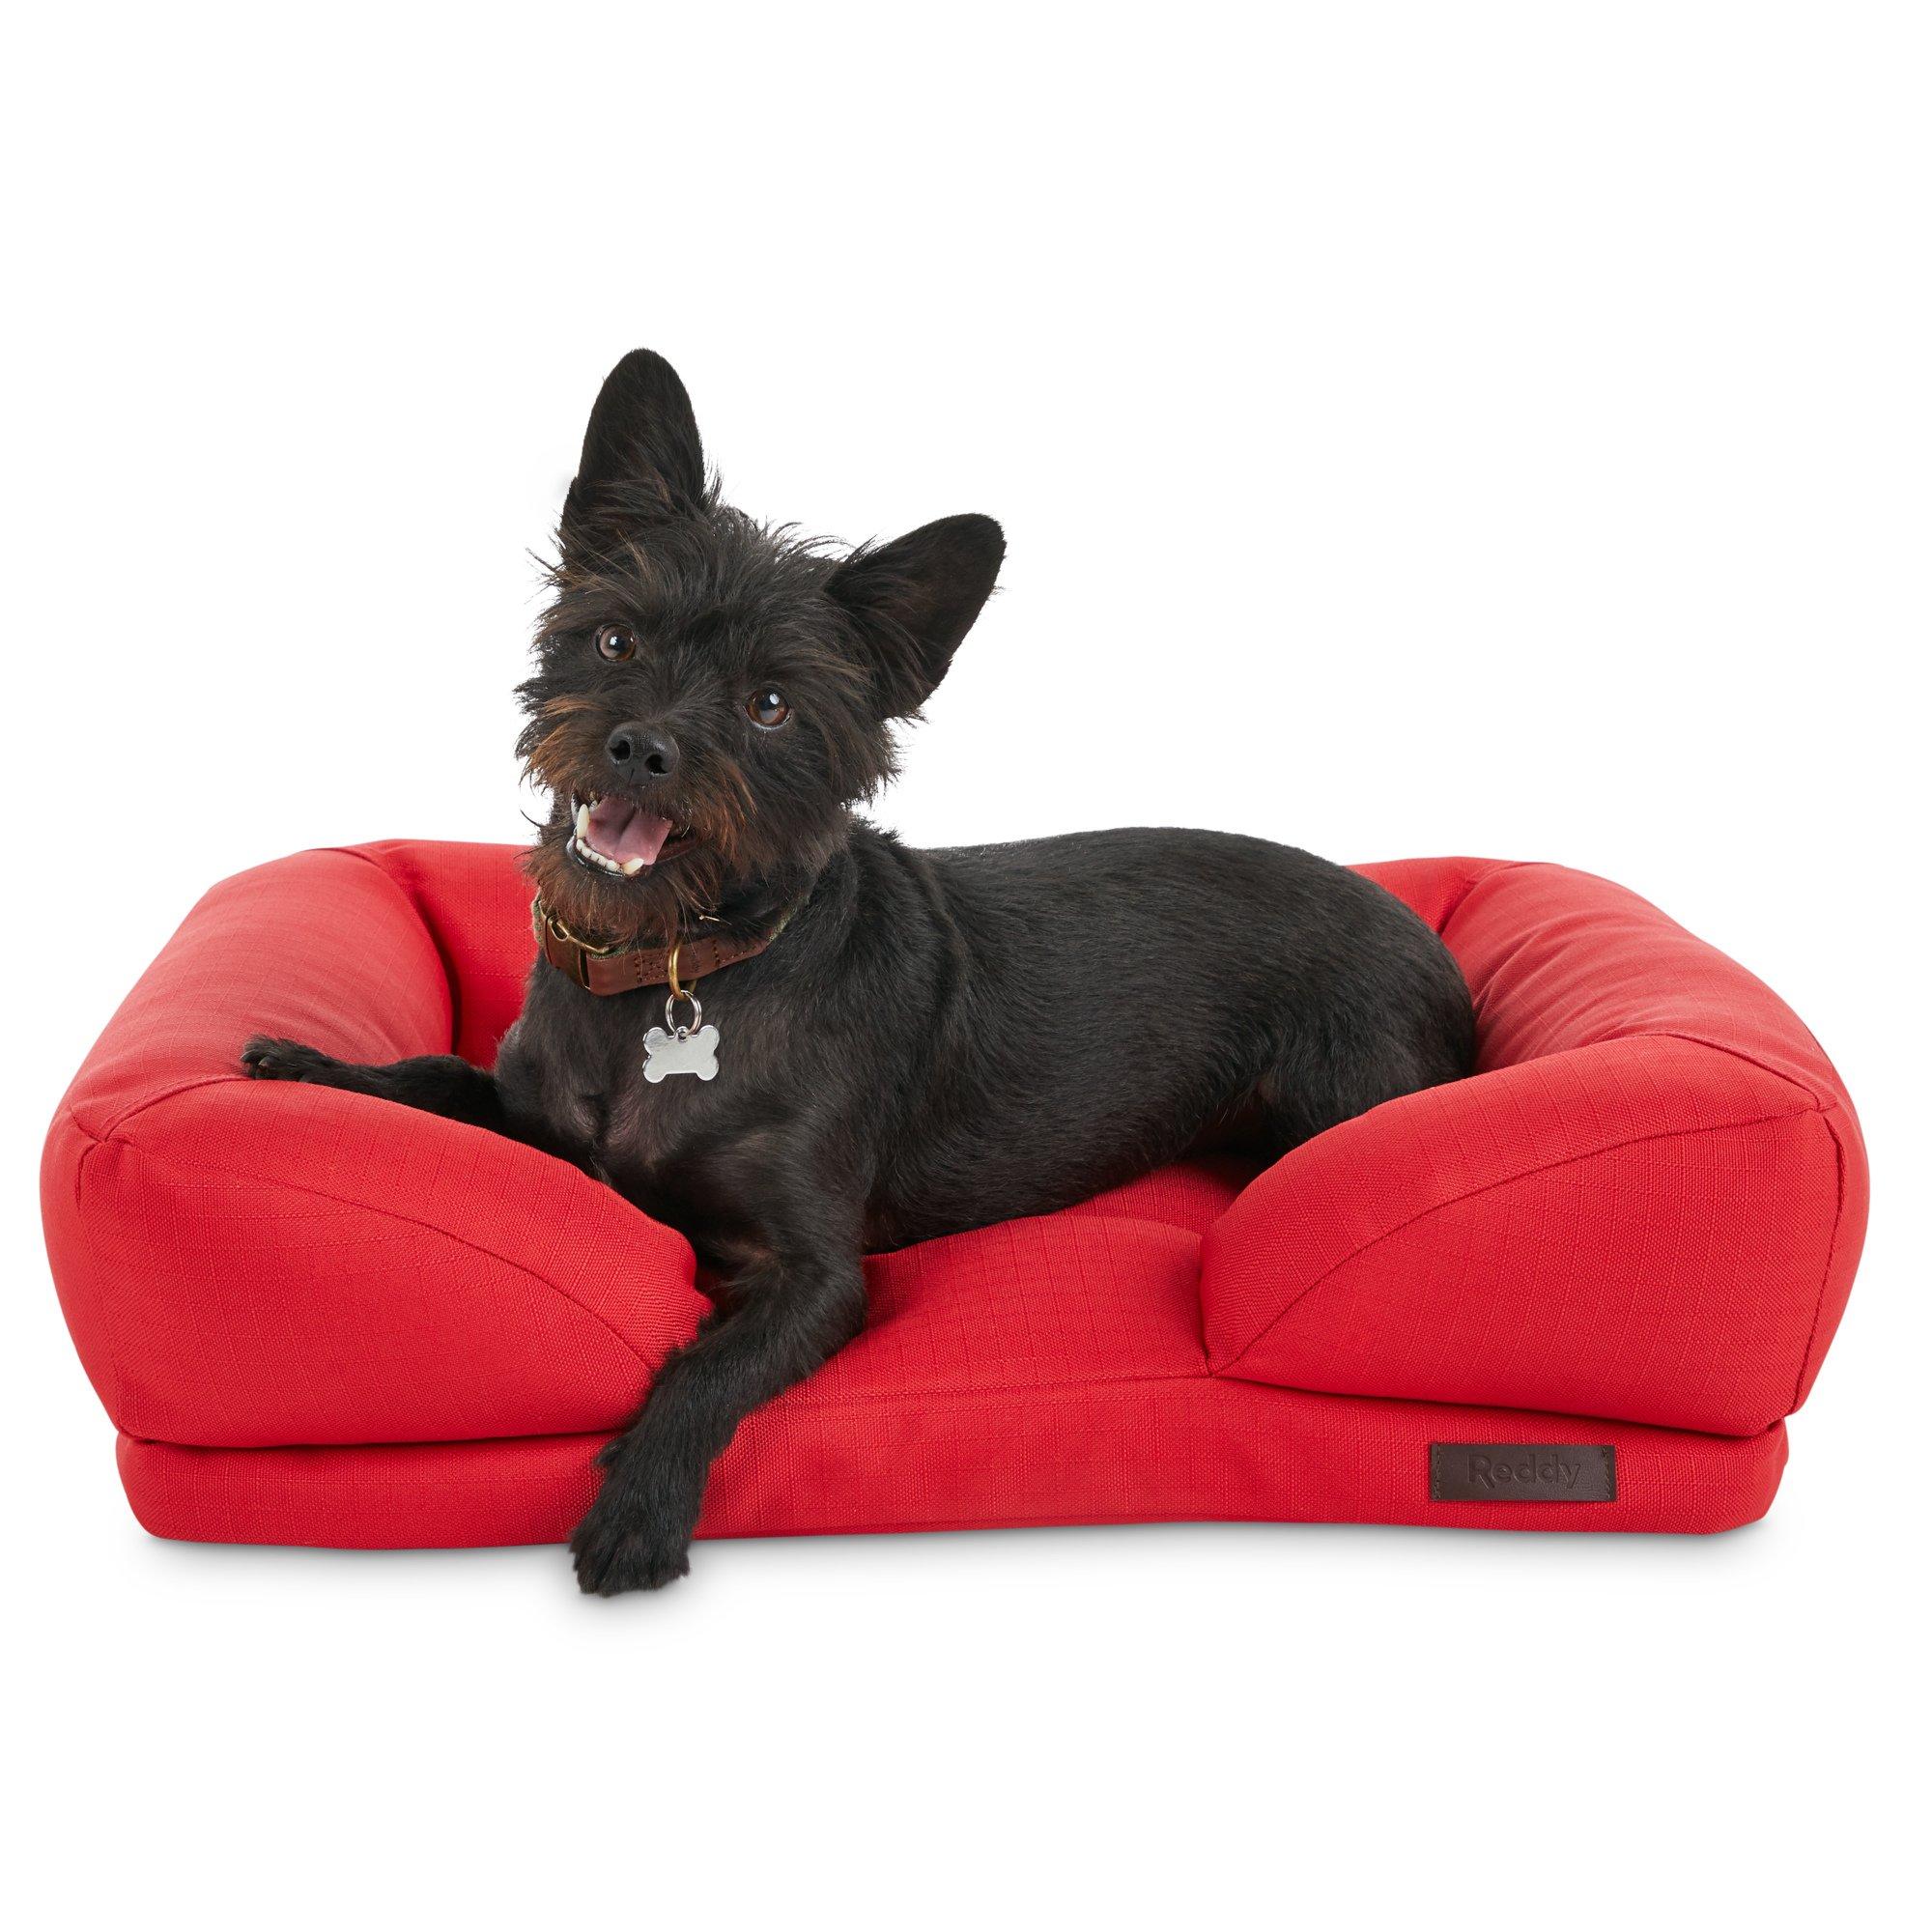 Wondrous Reddy Indoor Outdoor Red Dog Bed 24 L X 18 W Petco Machost Co Dining Chair Design Ideas Machostcouk